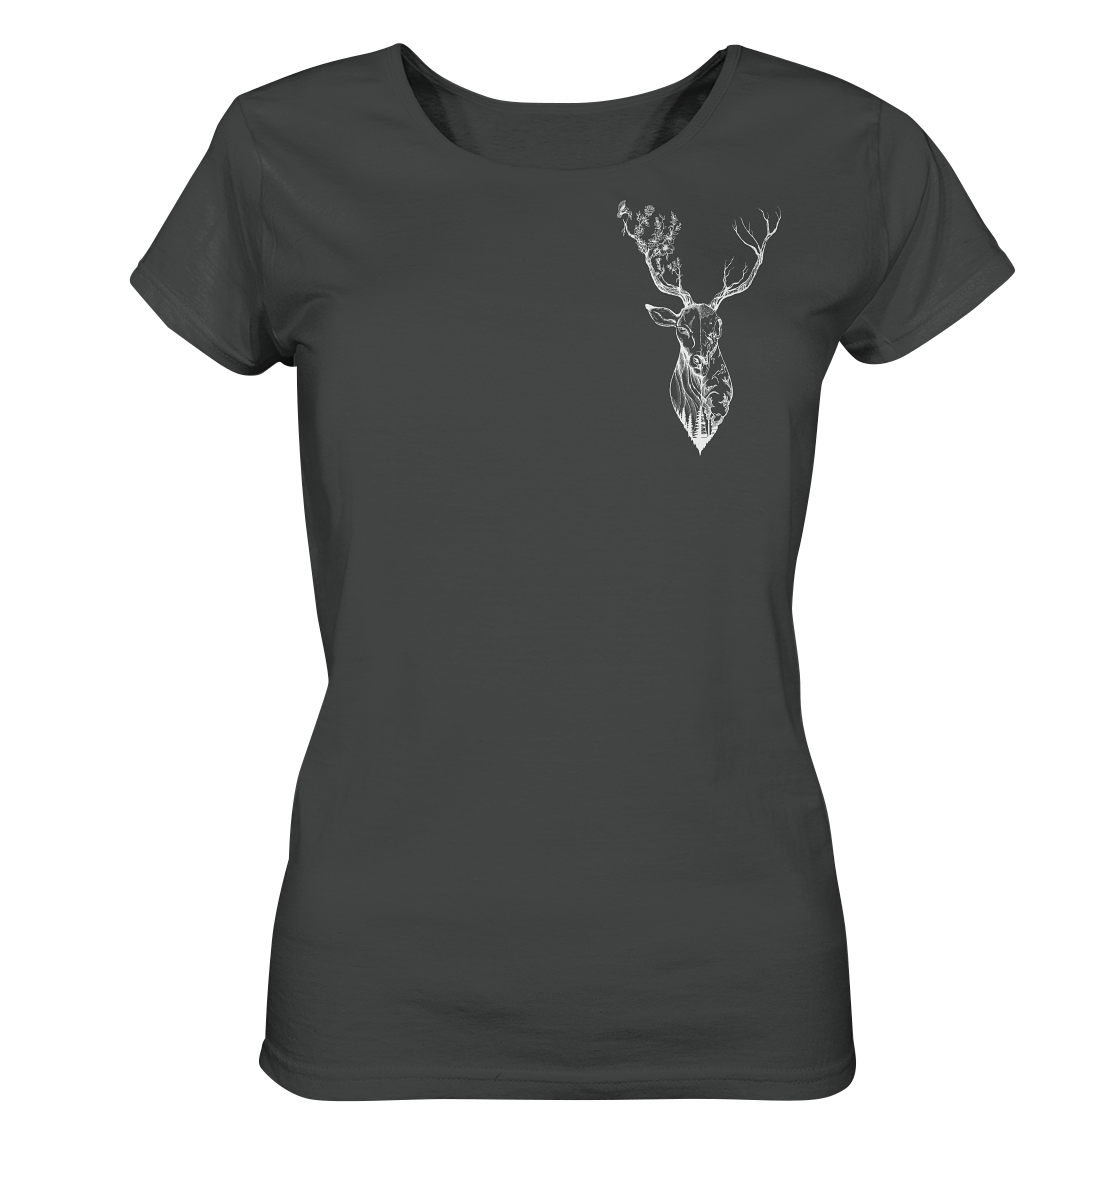 front-ladies-organic-shirt-444545-1116x-6.png